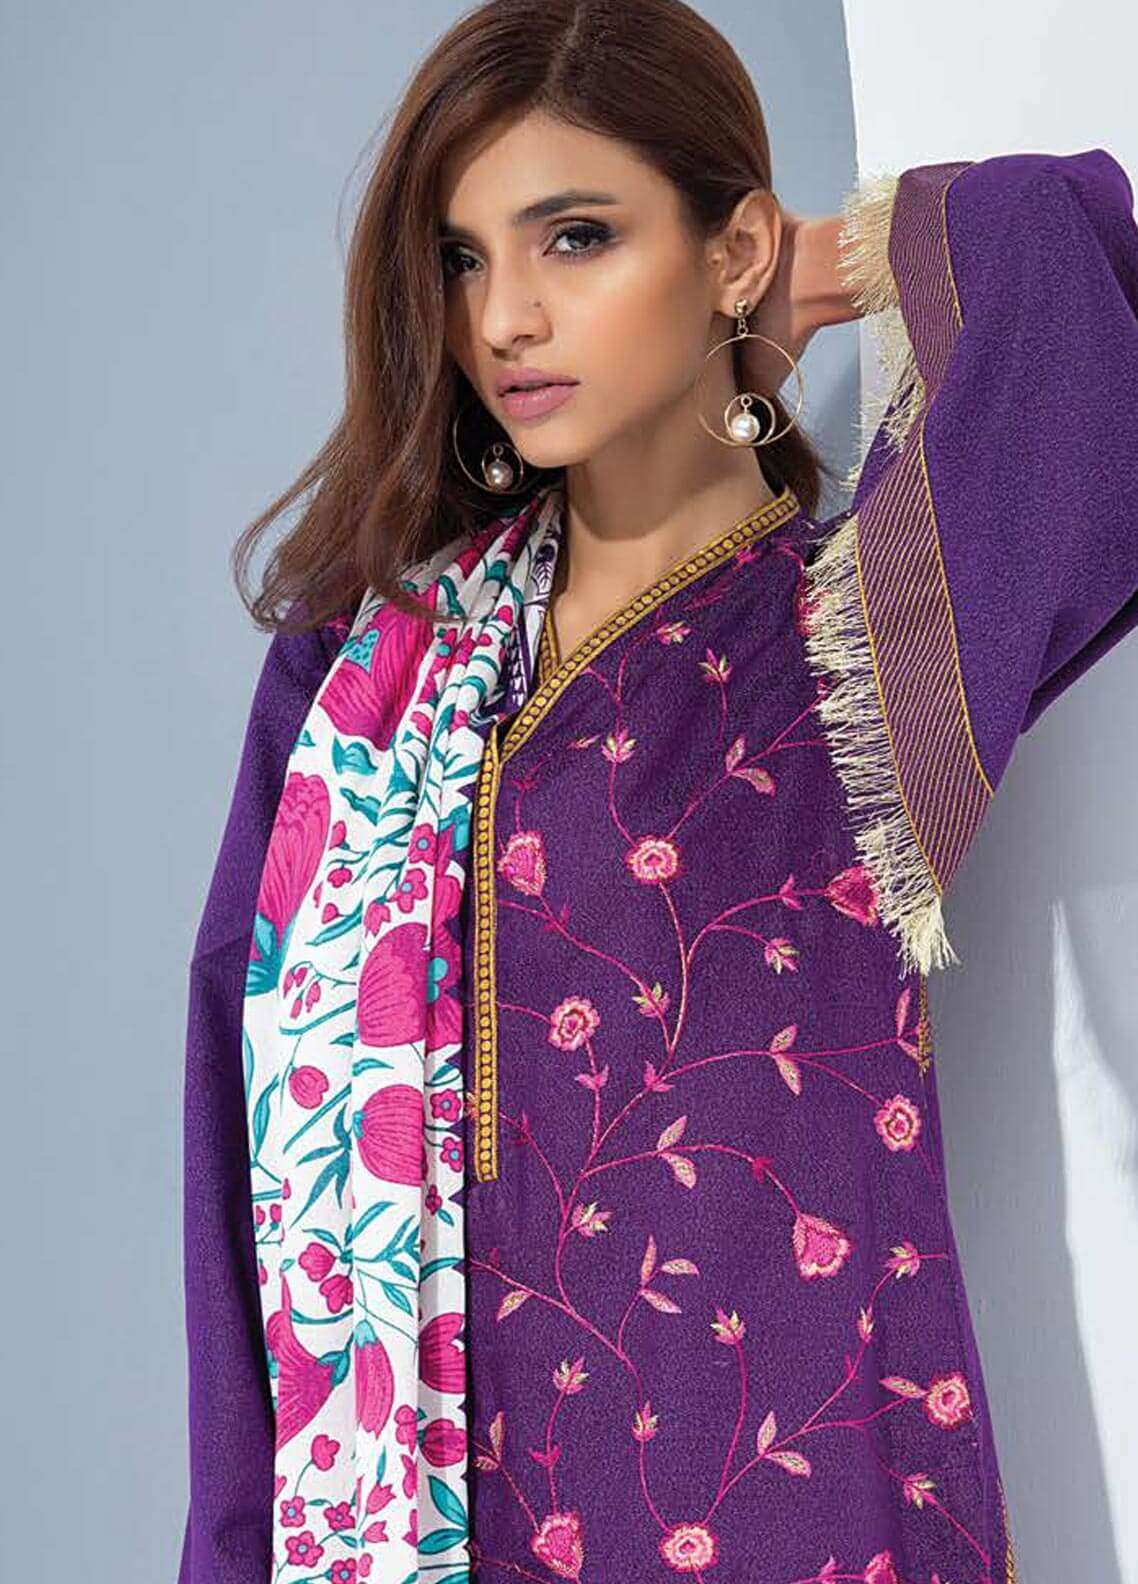 Orient Textile Embroidered karandi Unstitched 3 Piece Suit OT18W 243A Kalam Kari - Winter Collection